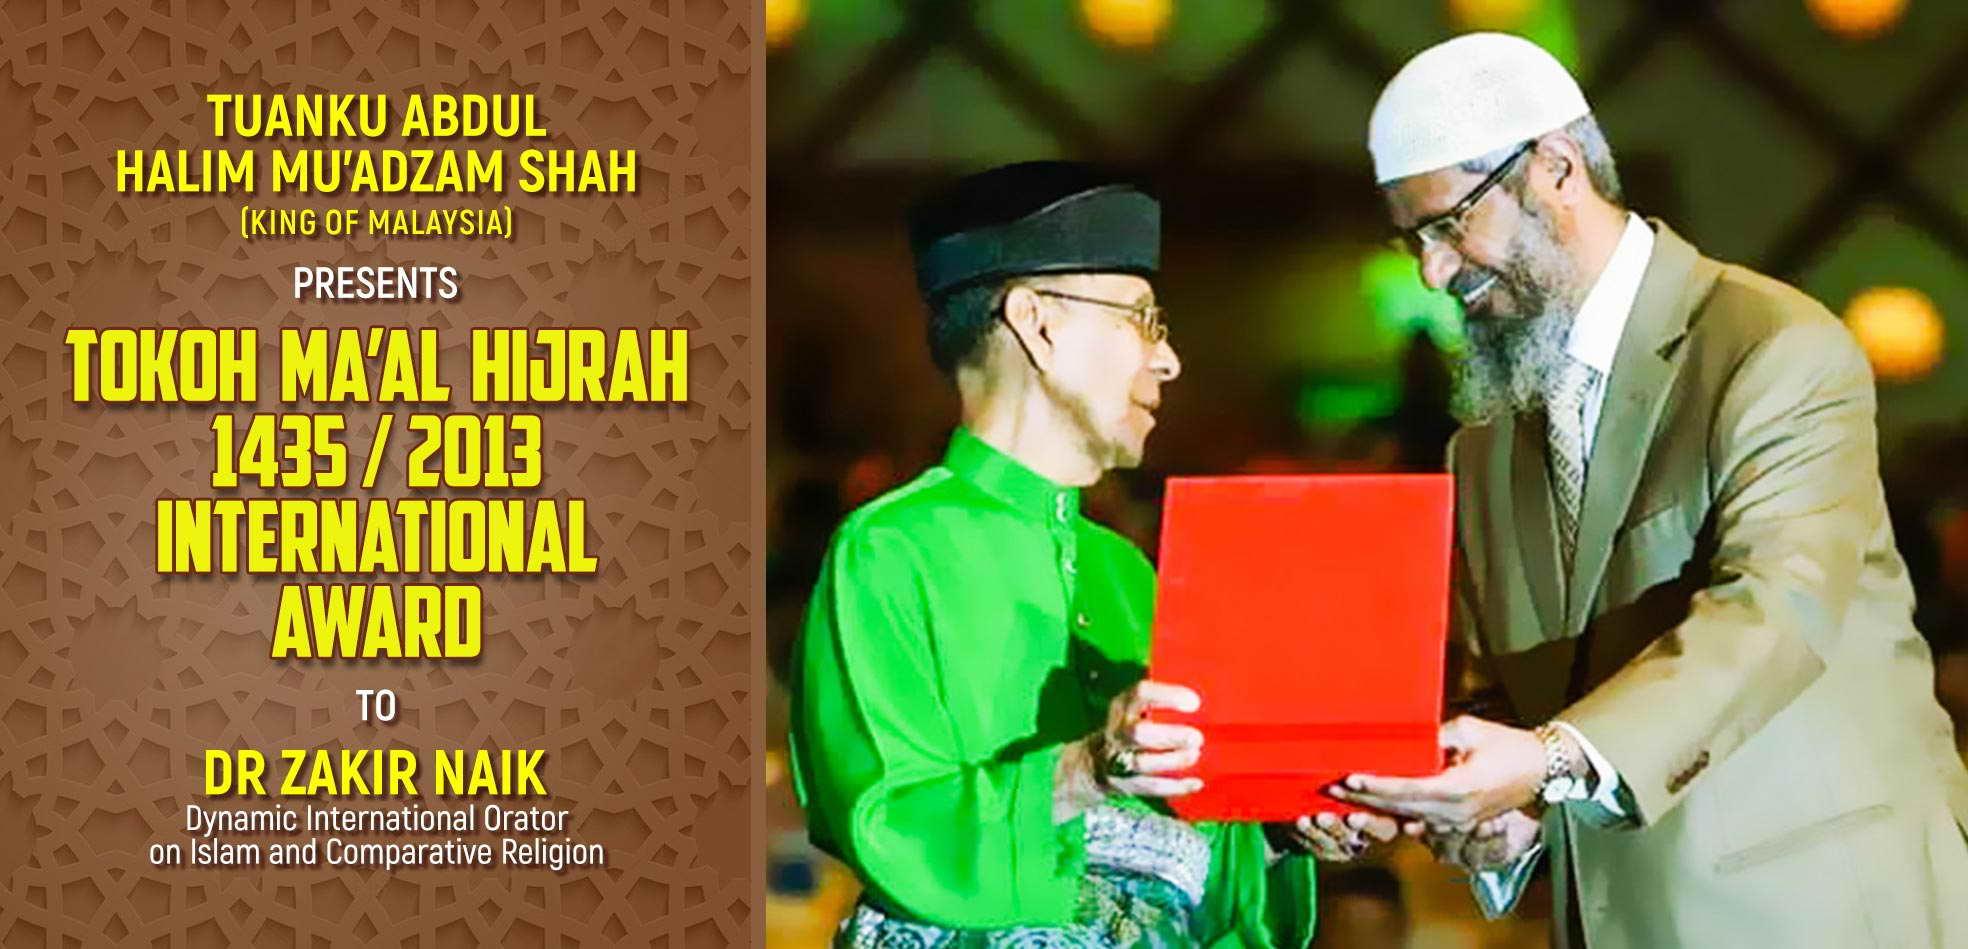 Tokoh Ma'al Hijrah 1435 / 2013 International Award